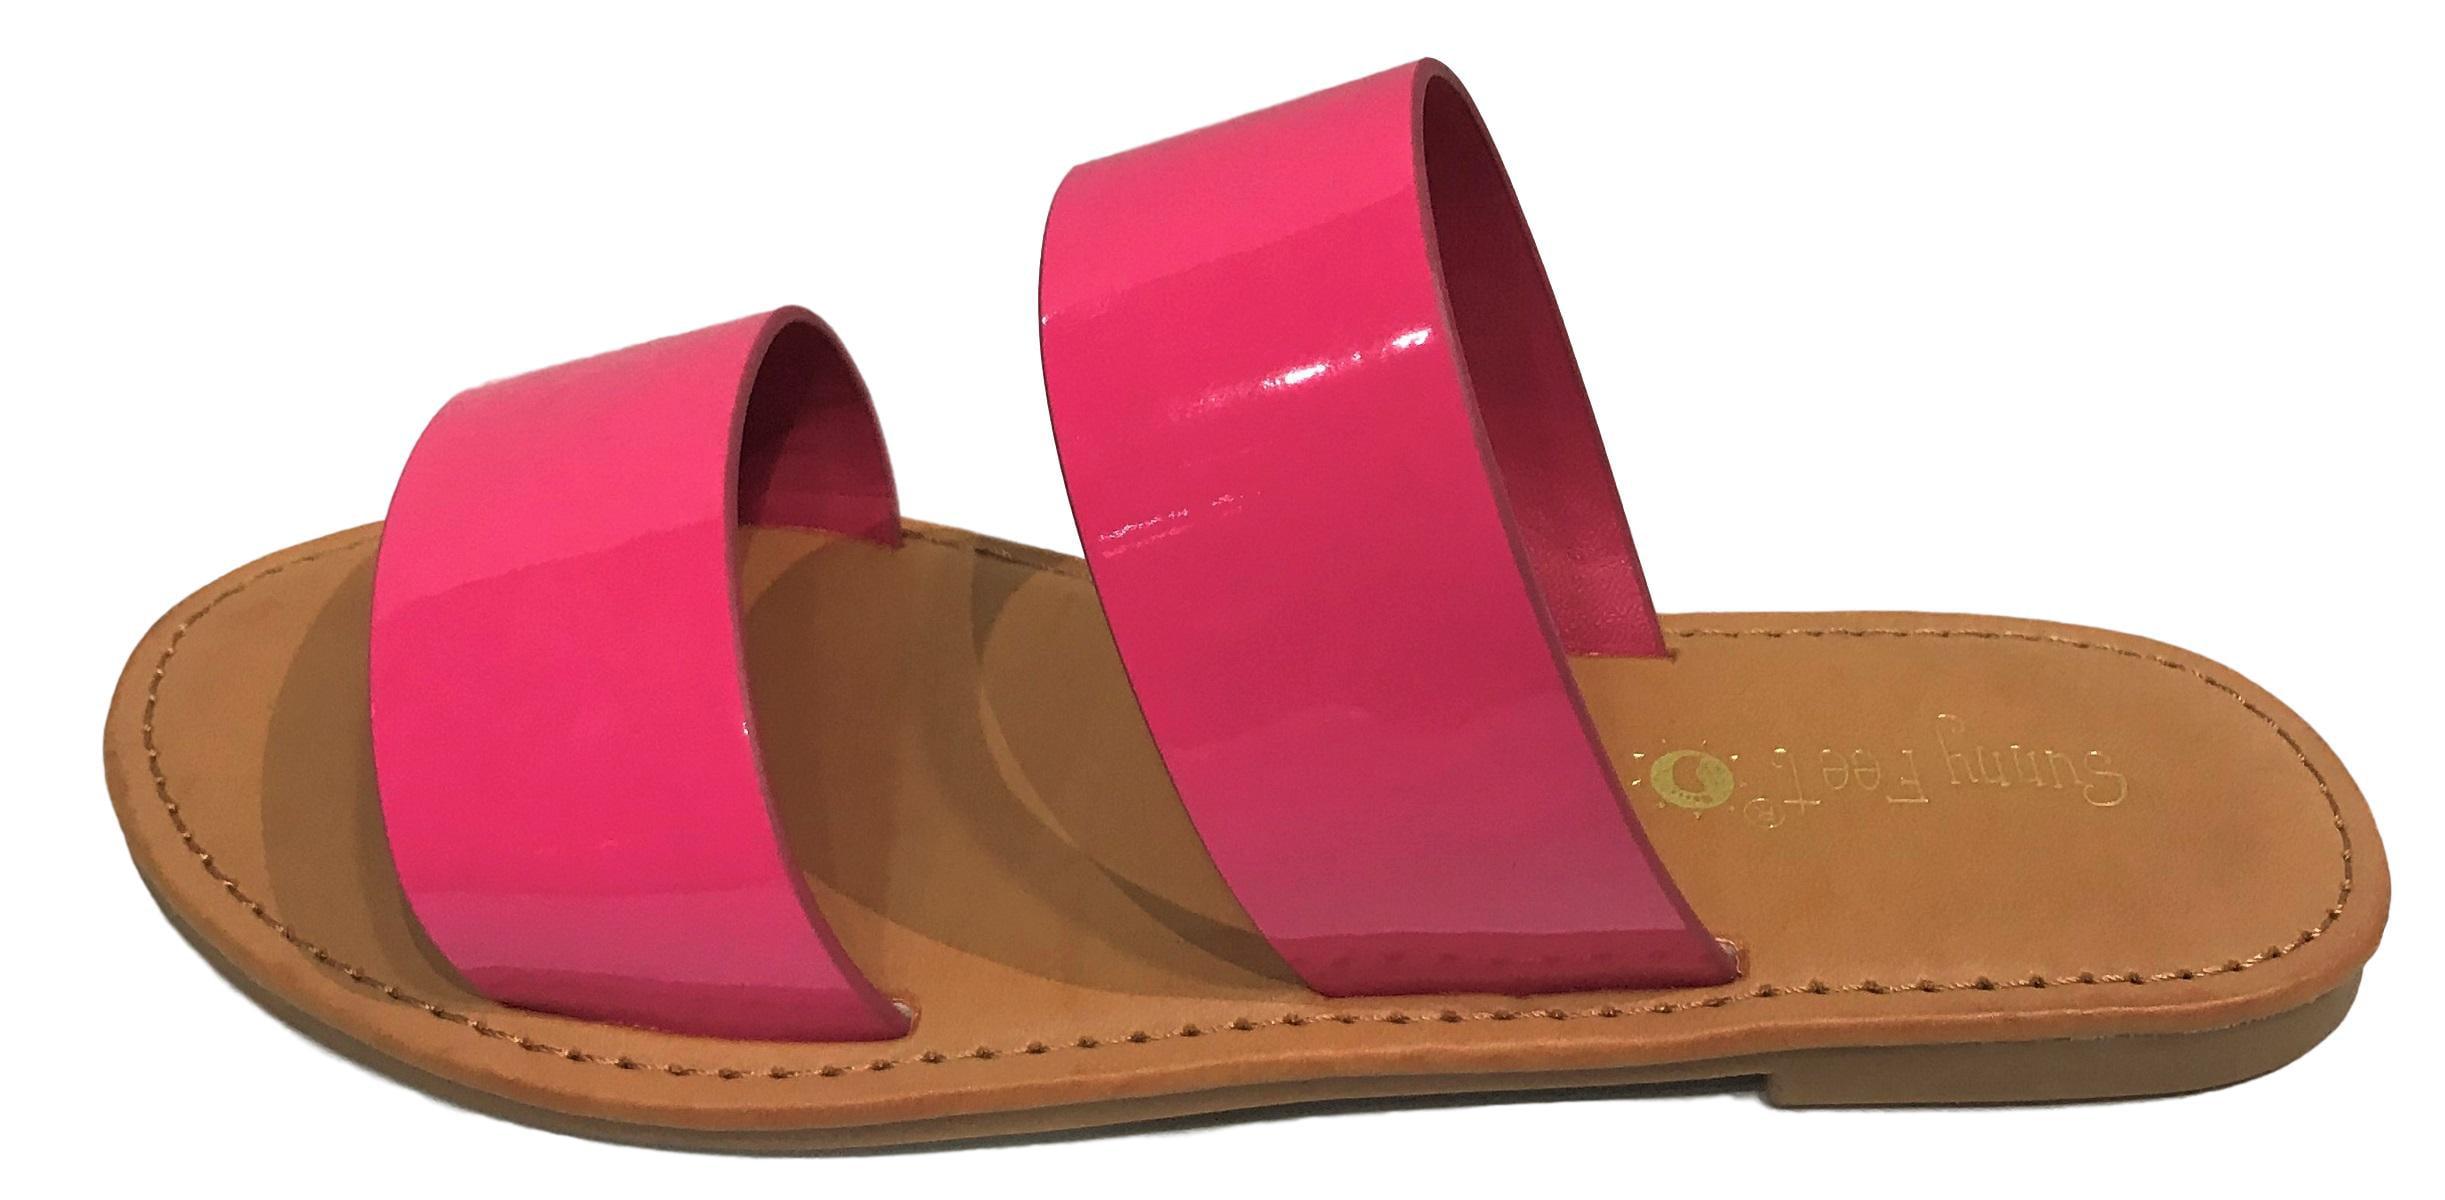 d1ab500e7 Sunny Feet - Coastline-64S Women Open Toe Slip On Double Band Flip Flops  Slide Flat Sandal Patent Fuschia - Walmart.com